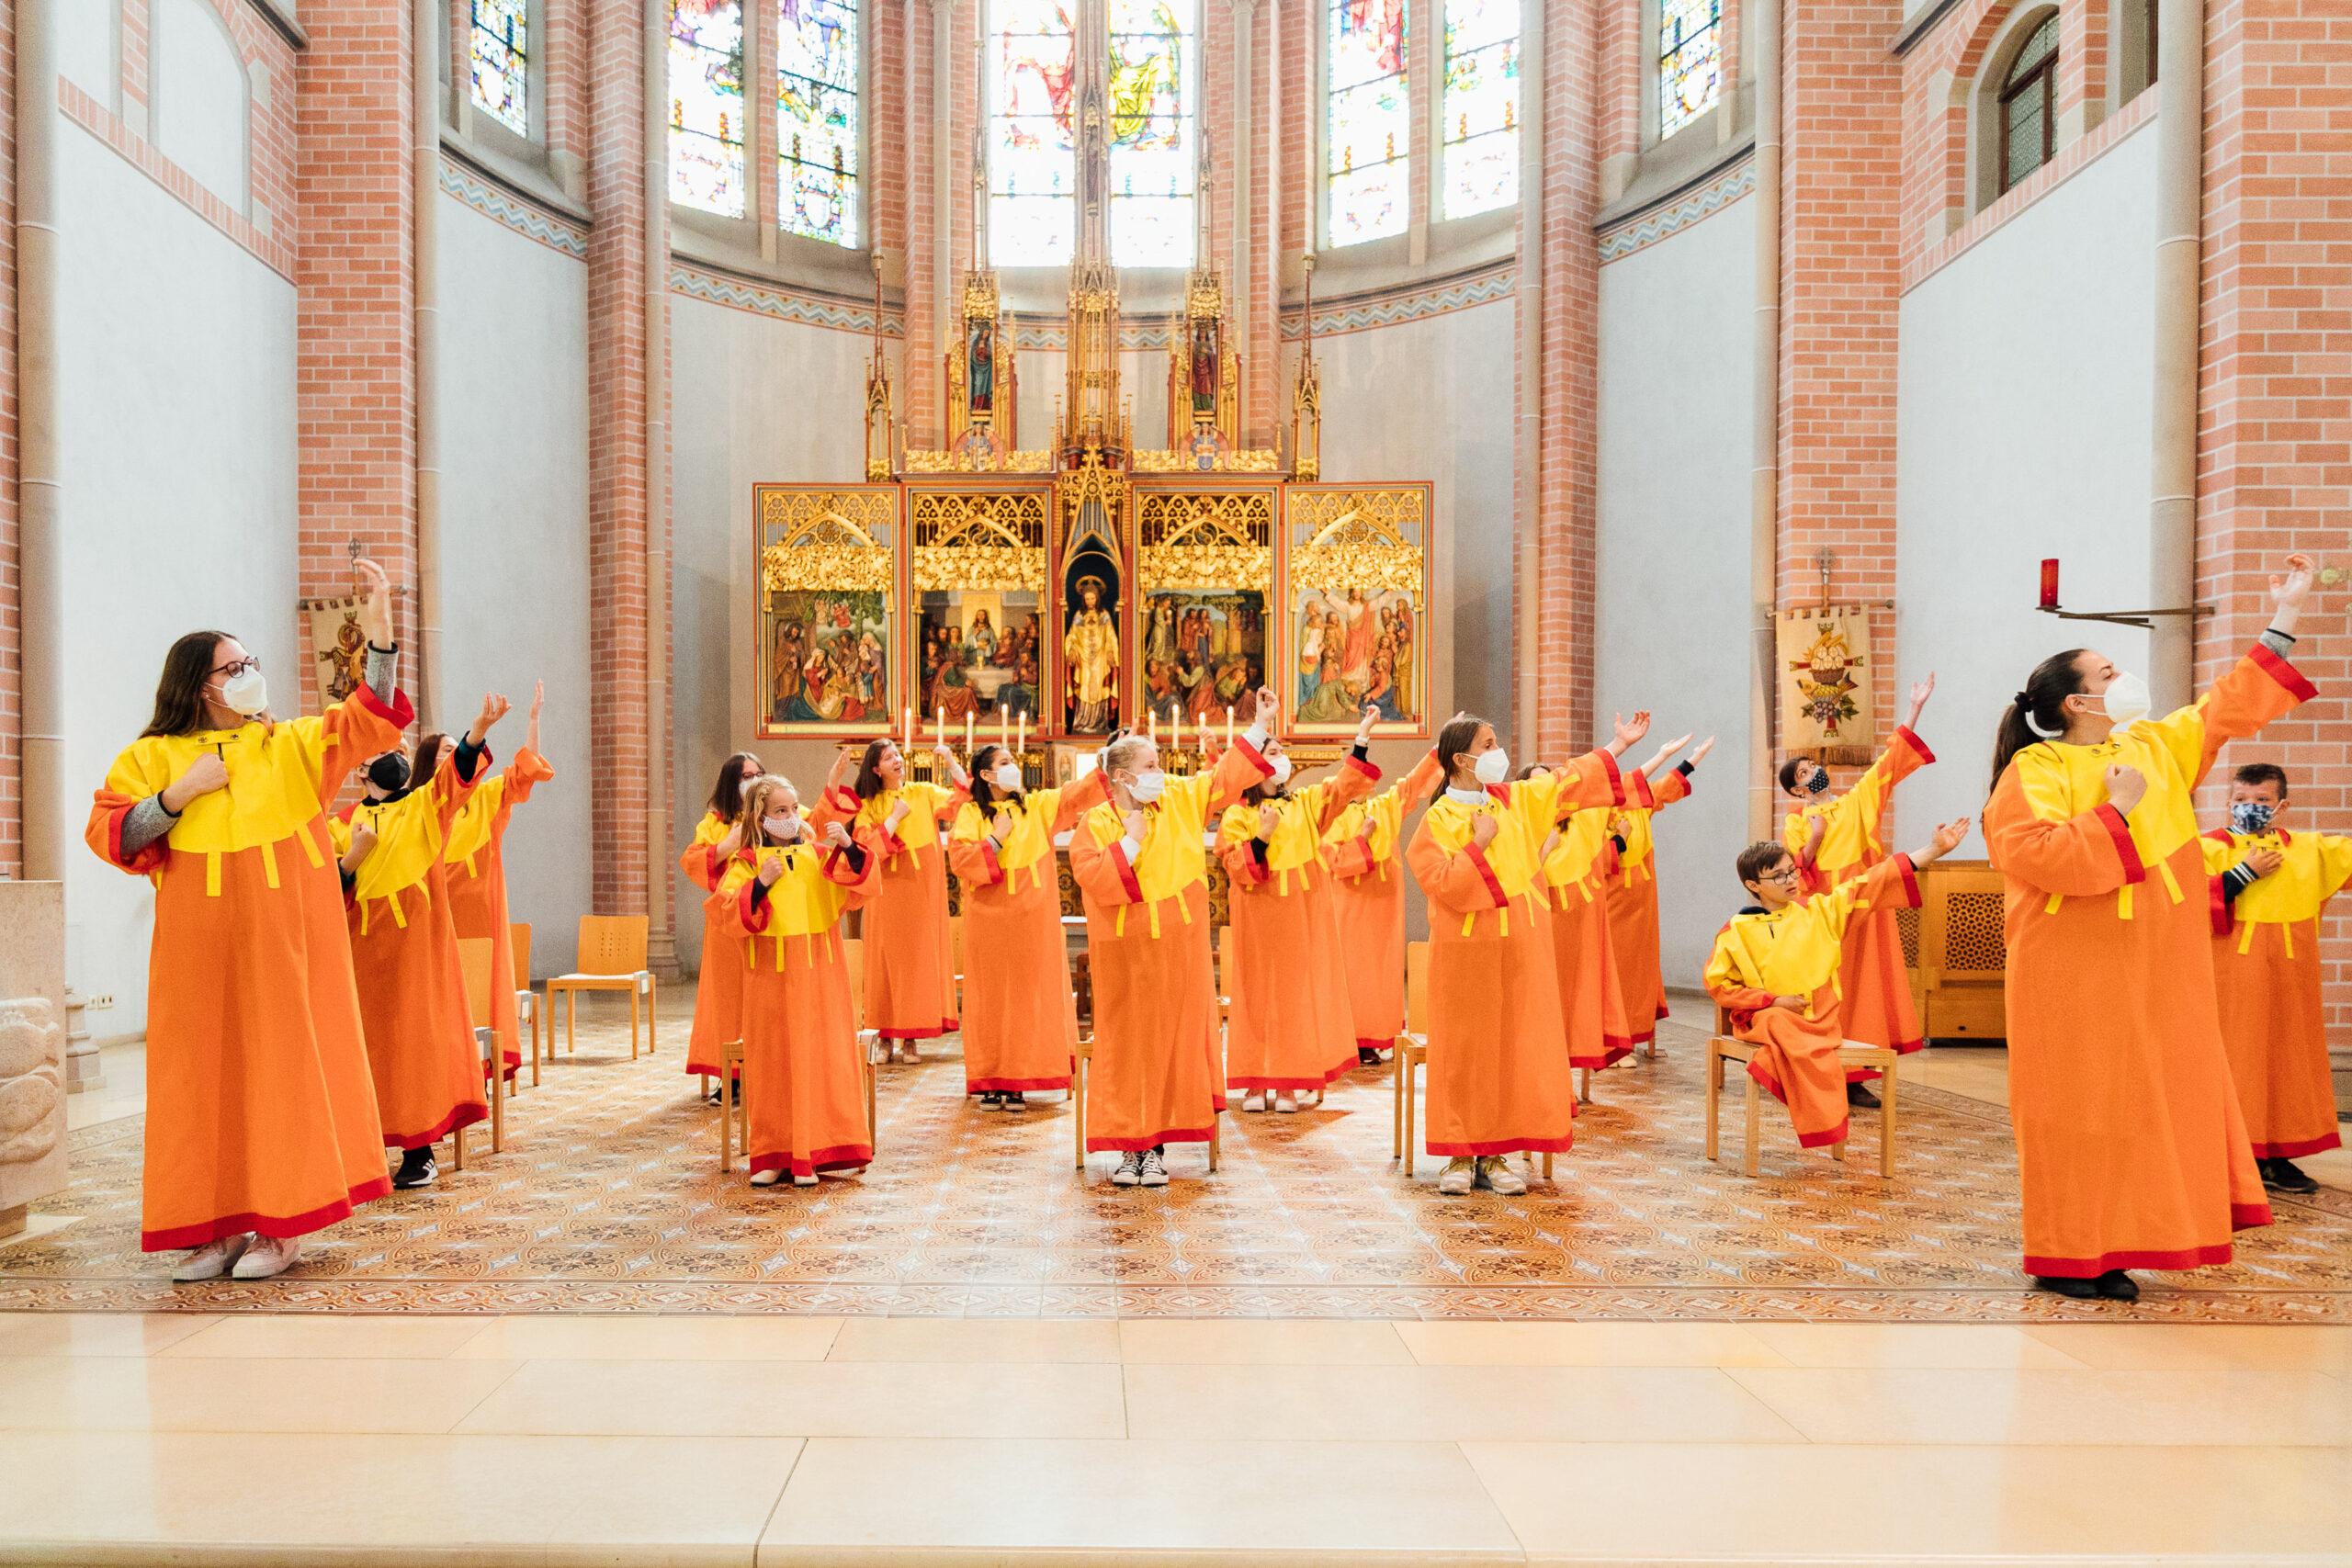 KISI Chor singt Erstkommunion